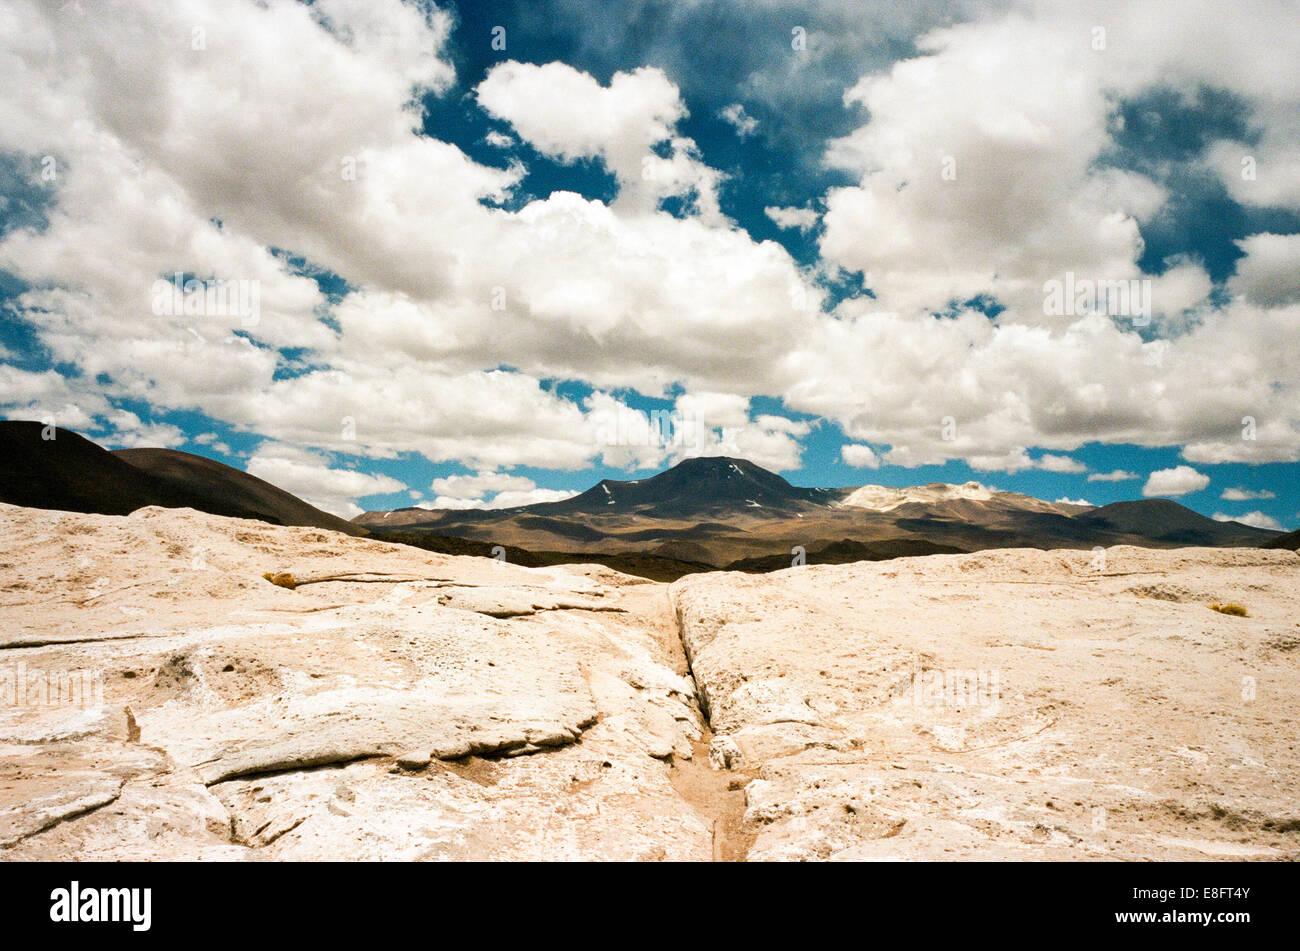 Chile, San Pedro de Atacam, Picture of mountain - Stock Image